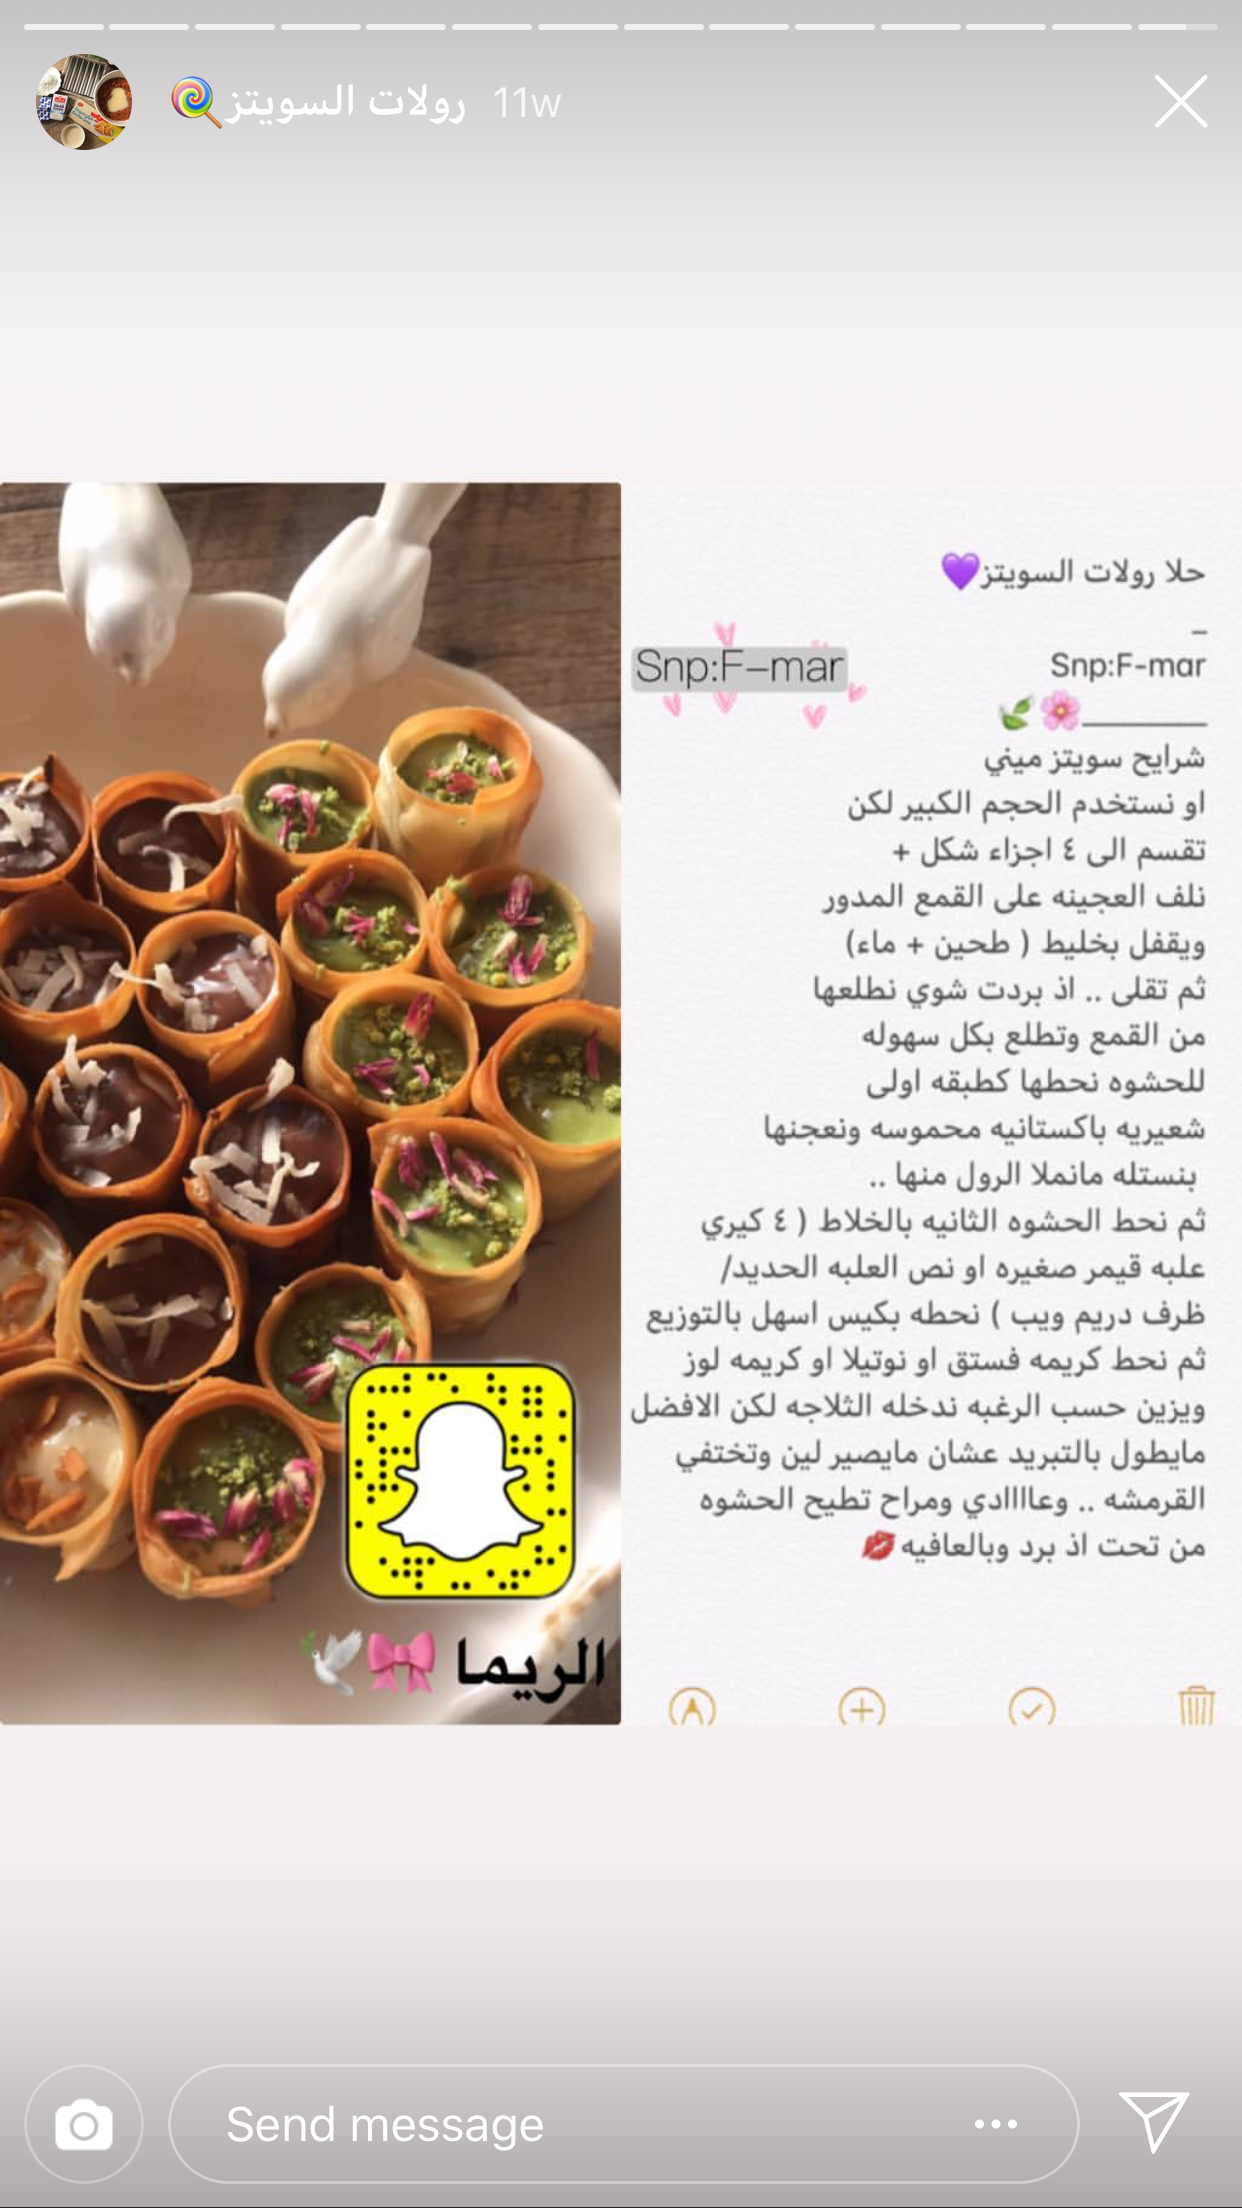 Pin By Maryam Alali On سويتات Diy Food Recipes Yummy Food Dessert Food Recipies